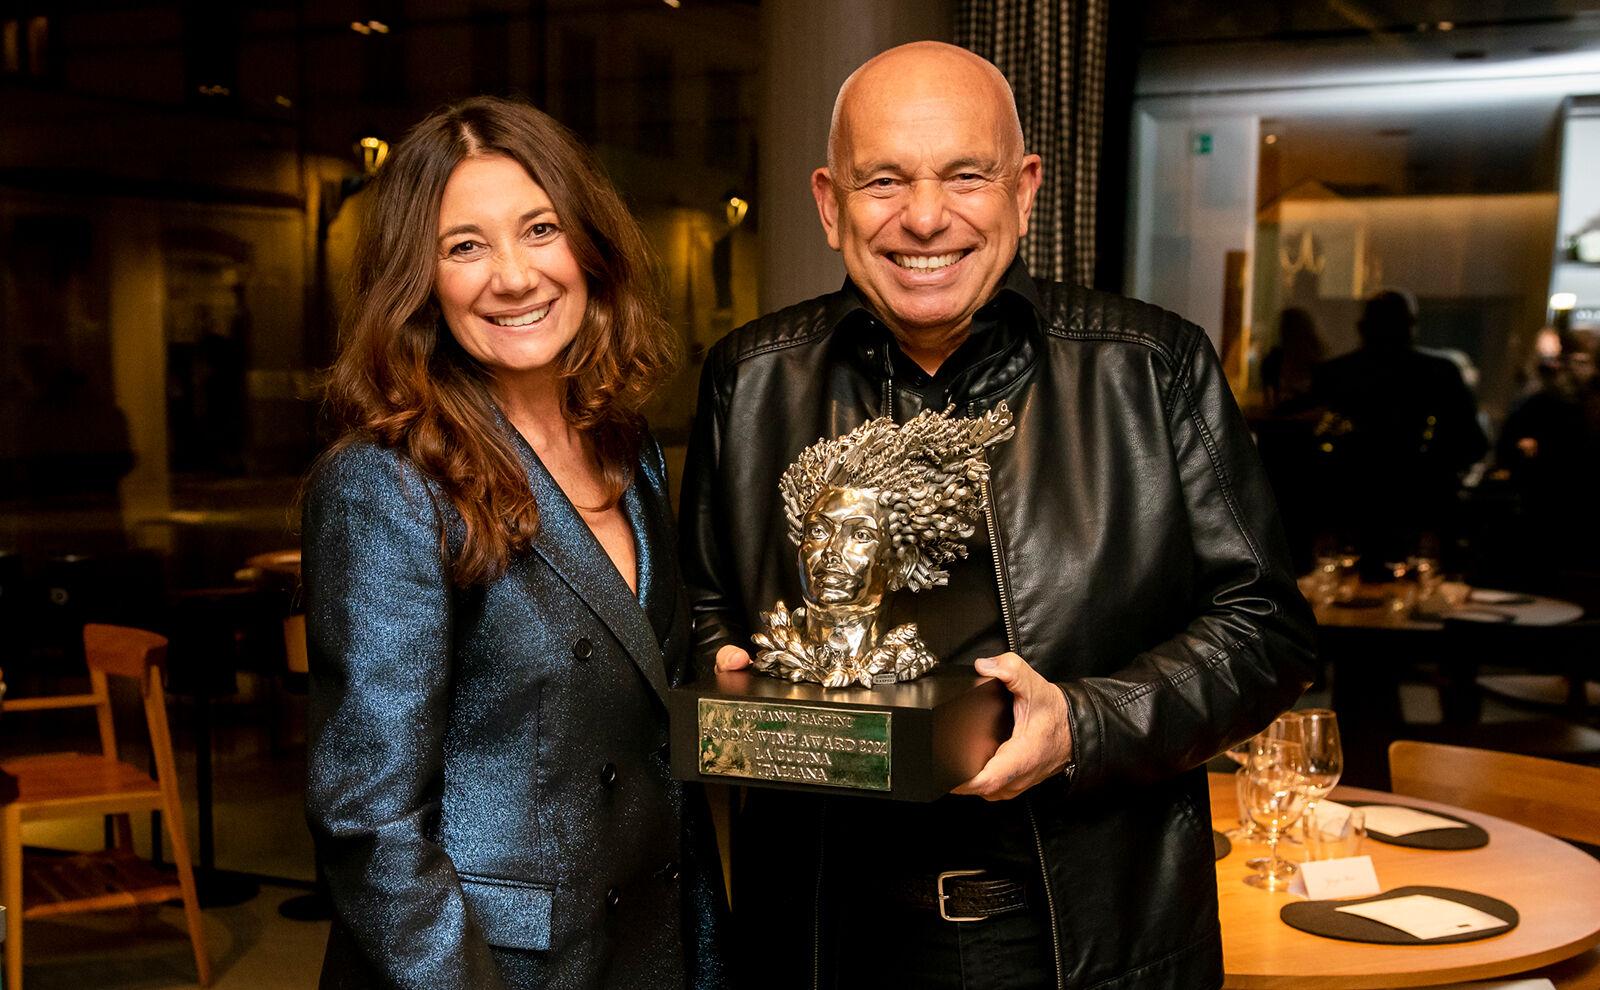 The Giovanni Raspini Food & Wine Award 2021 for La Cucina Italiana